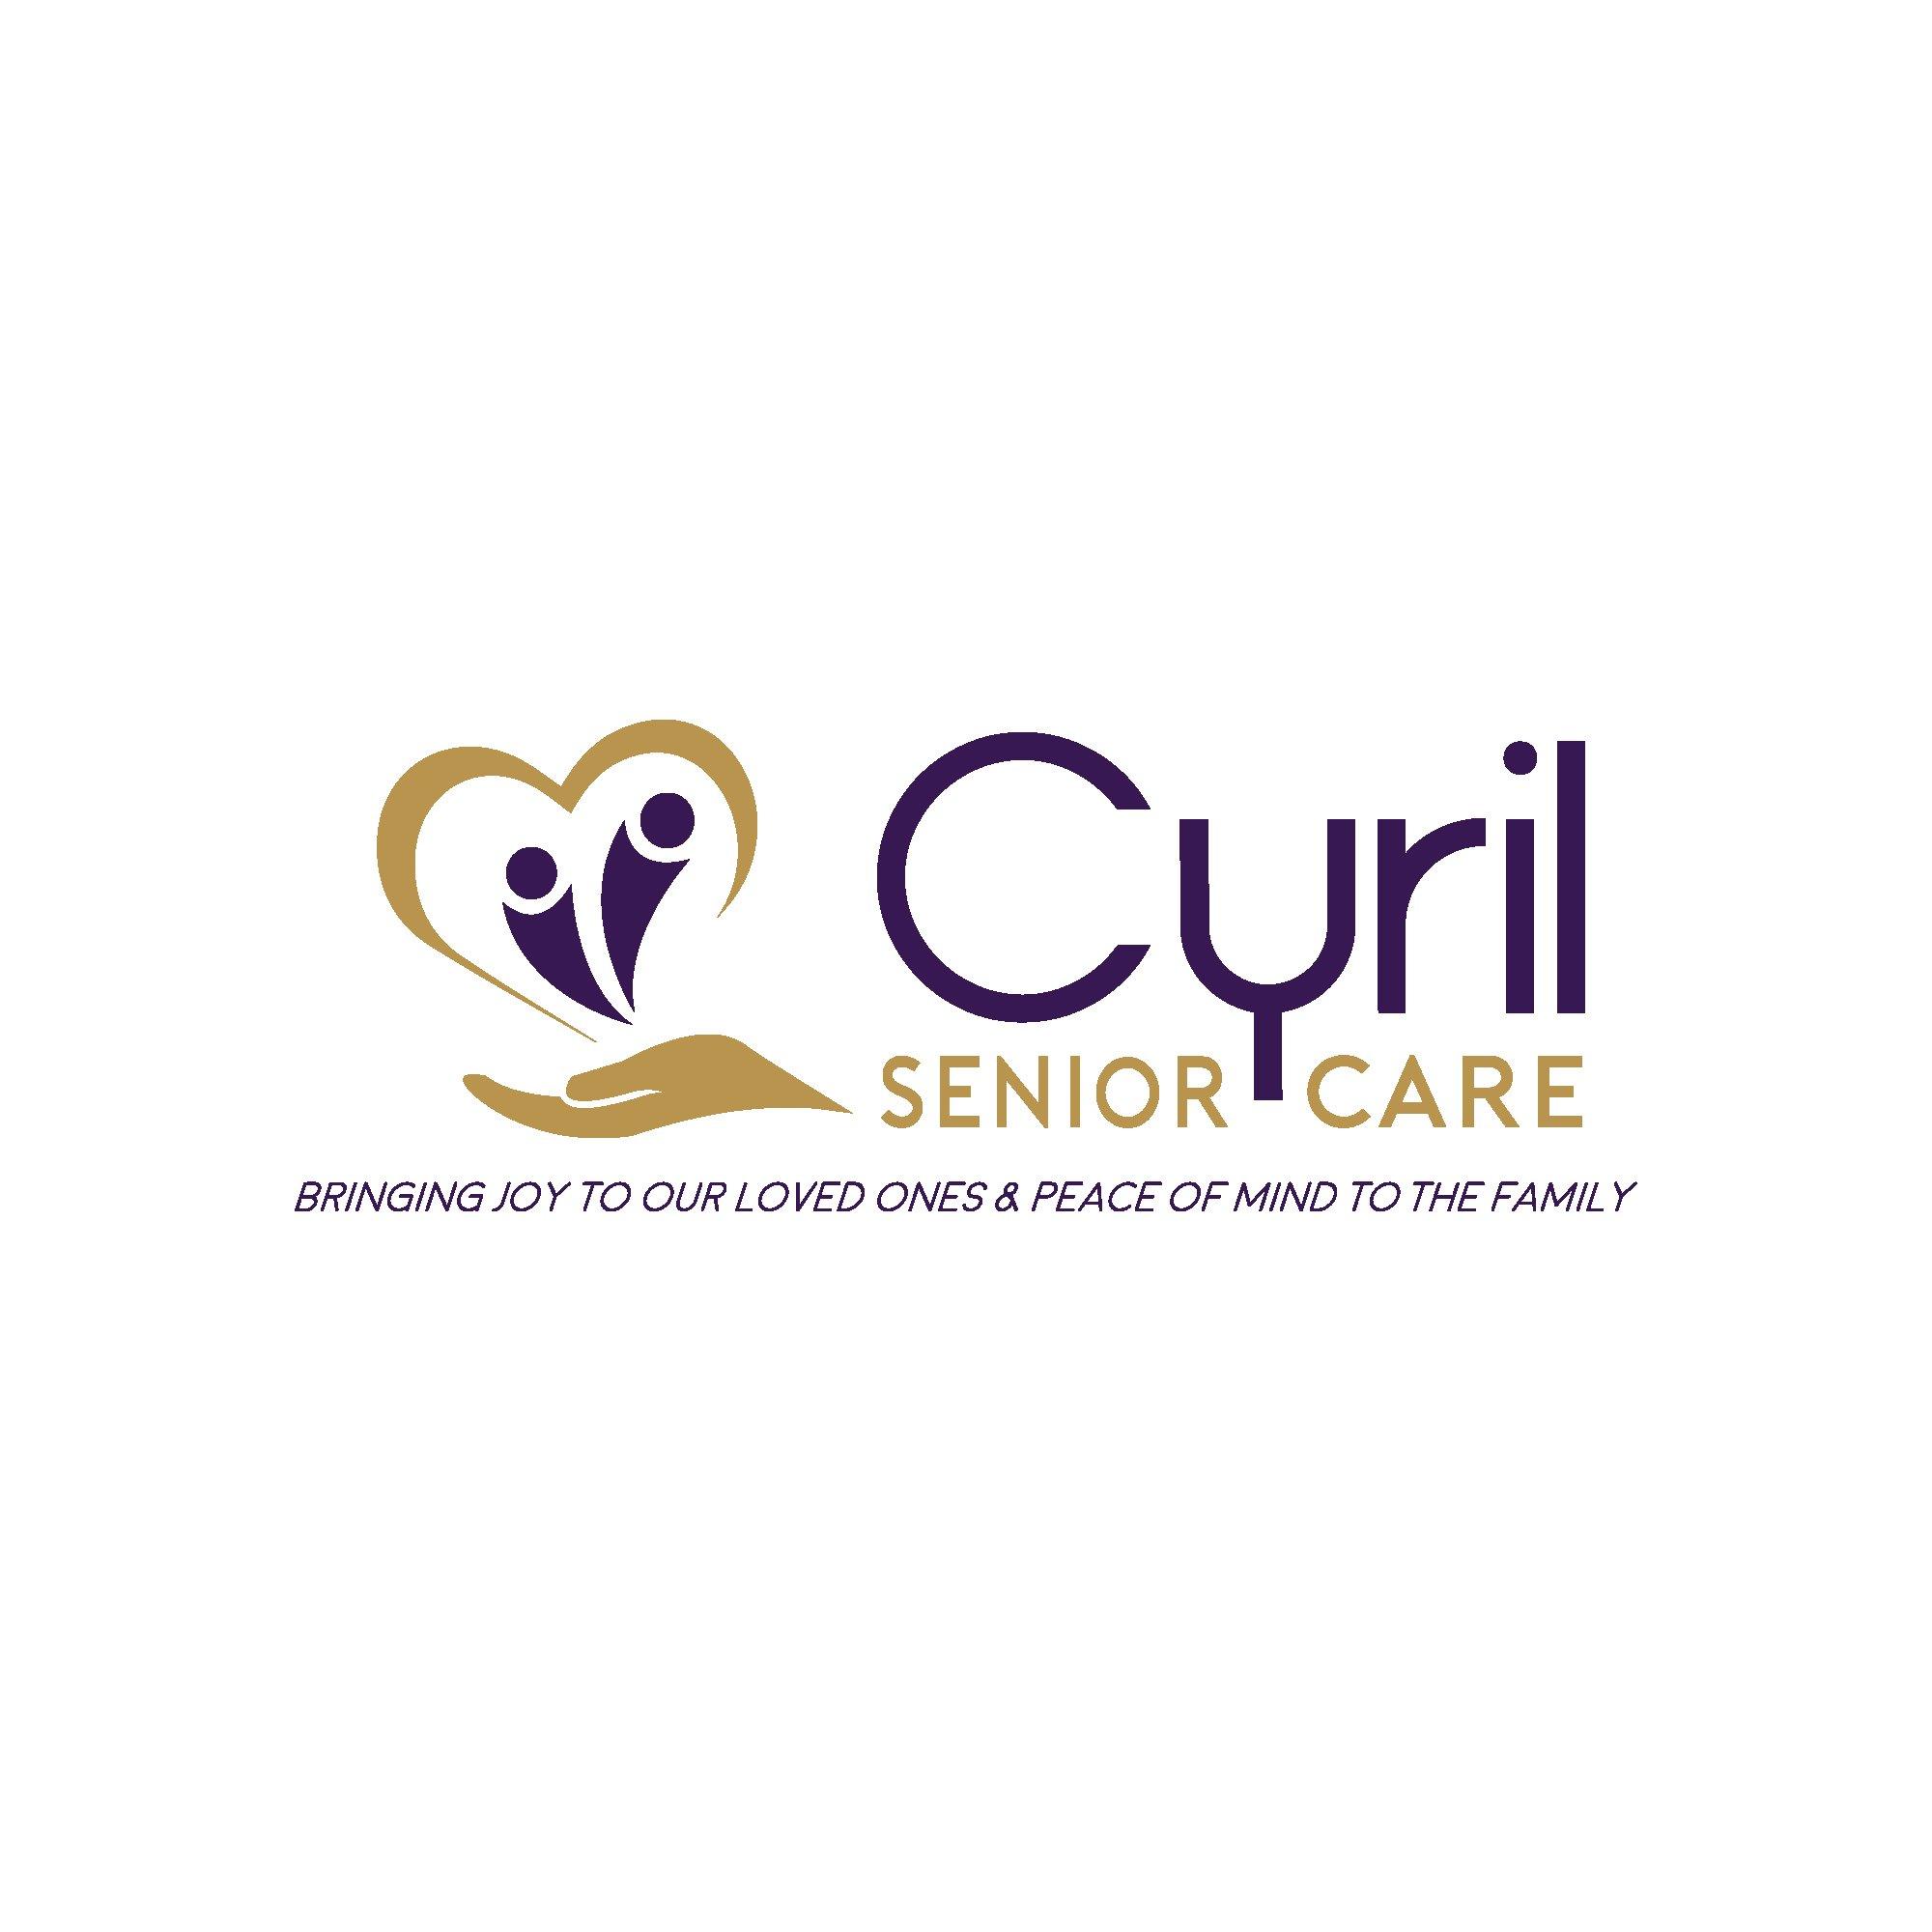 Cyril Senior Care